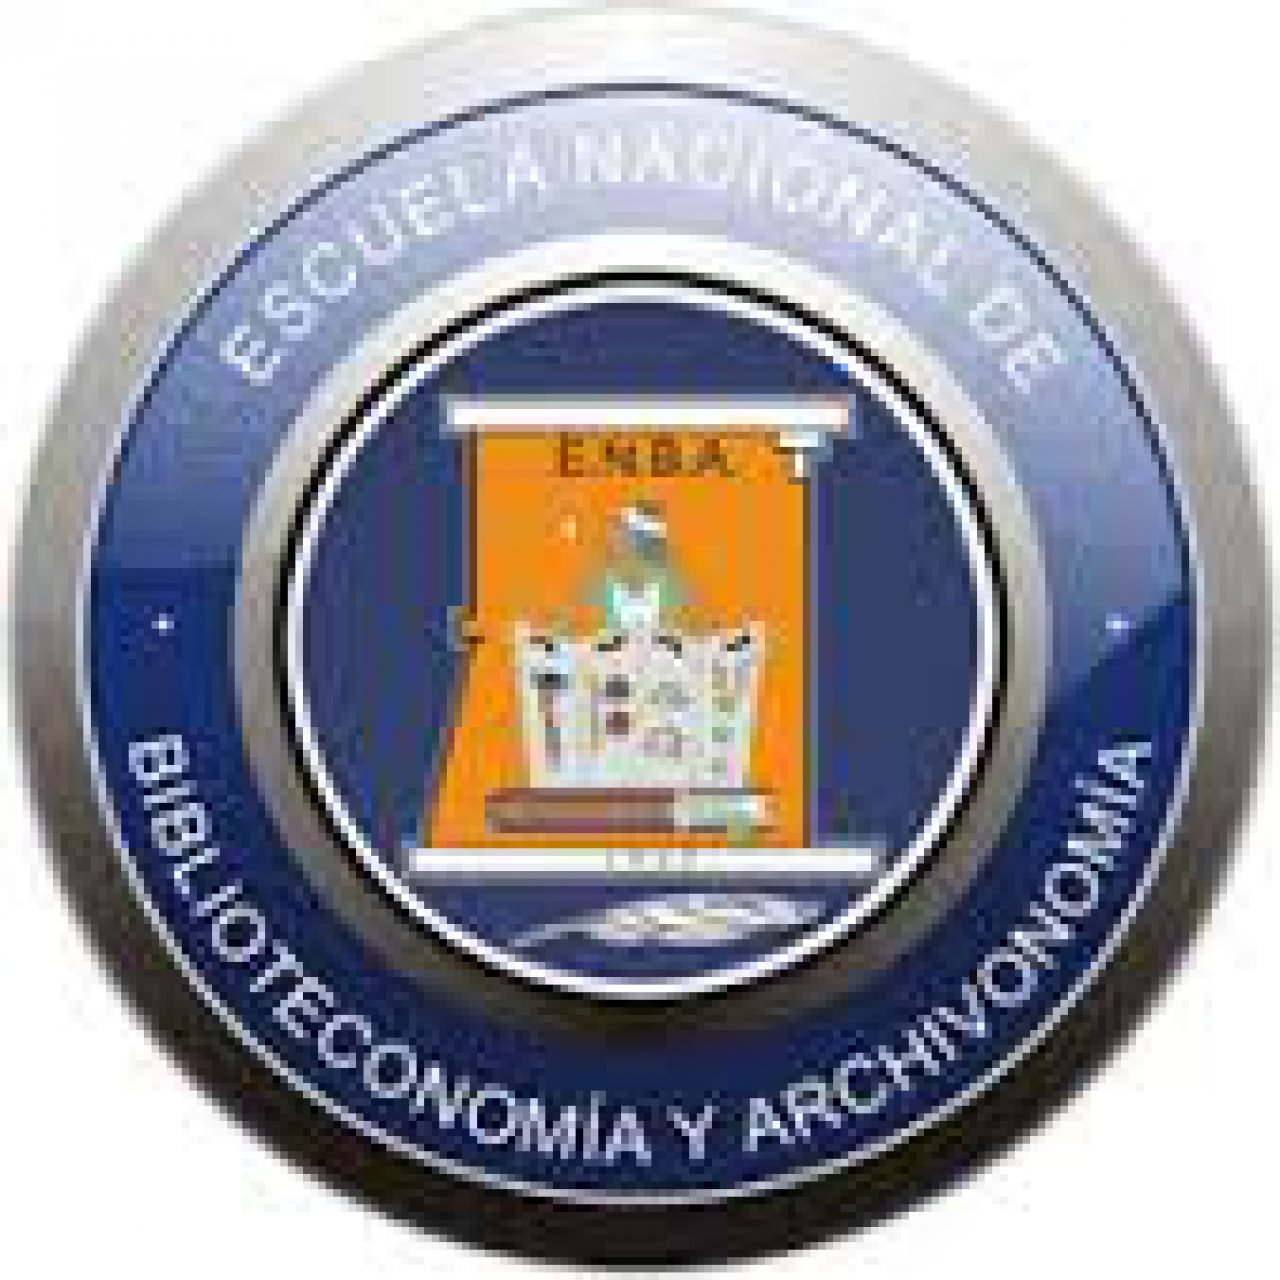 escuela nacional biblioteconomia archivonomia: